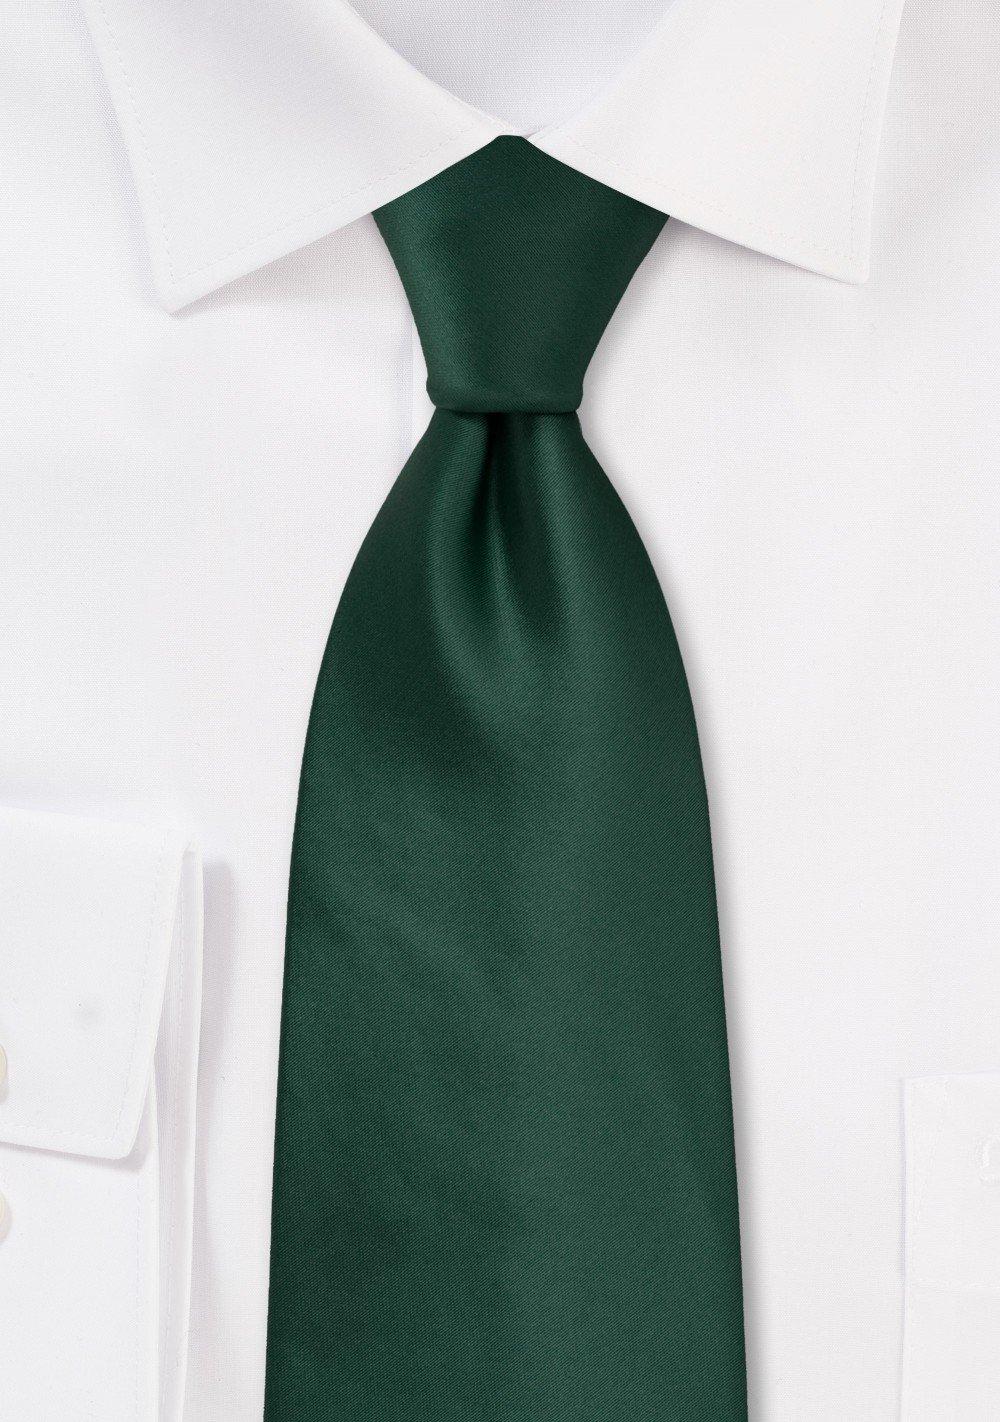 Solid Dark Green Tie in Extra Long